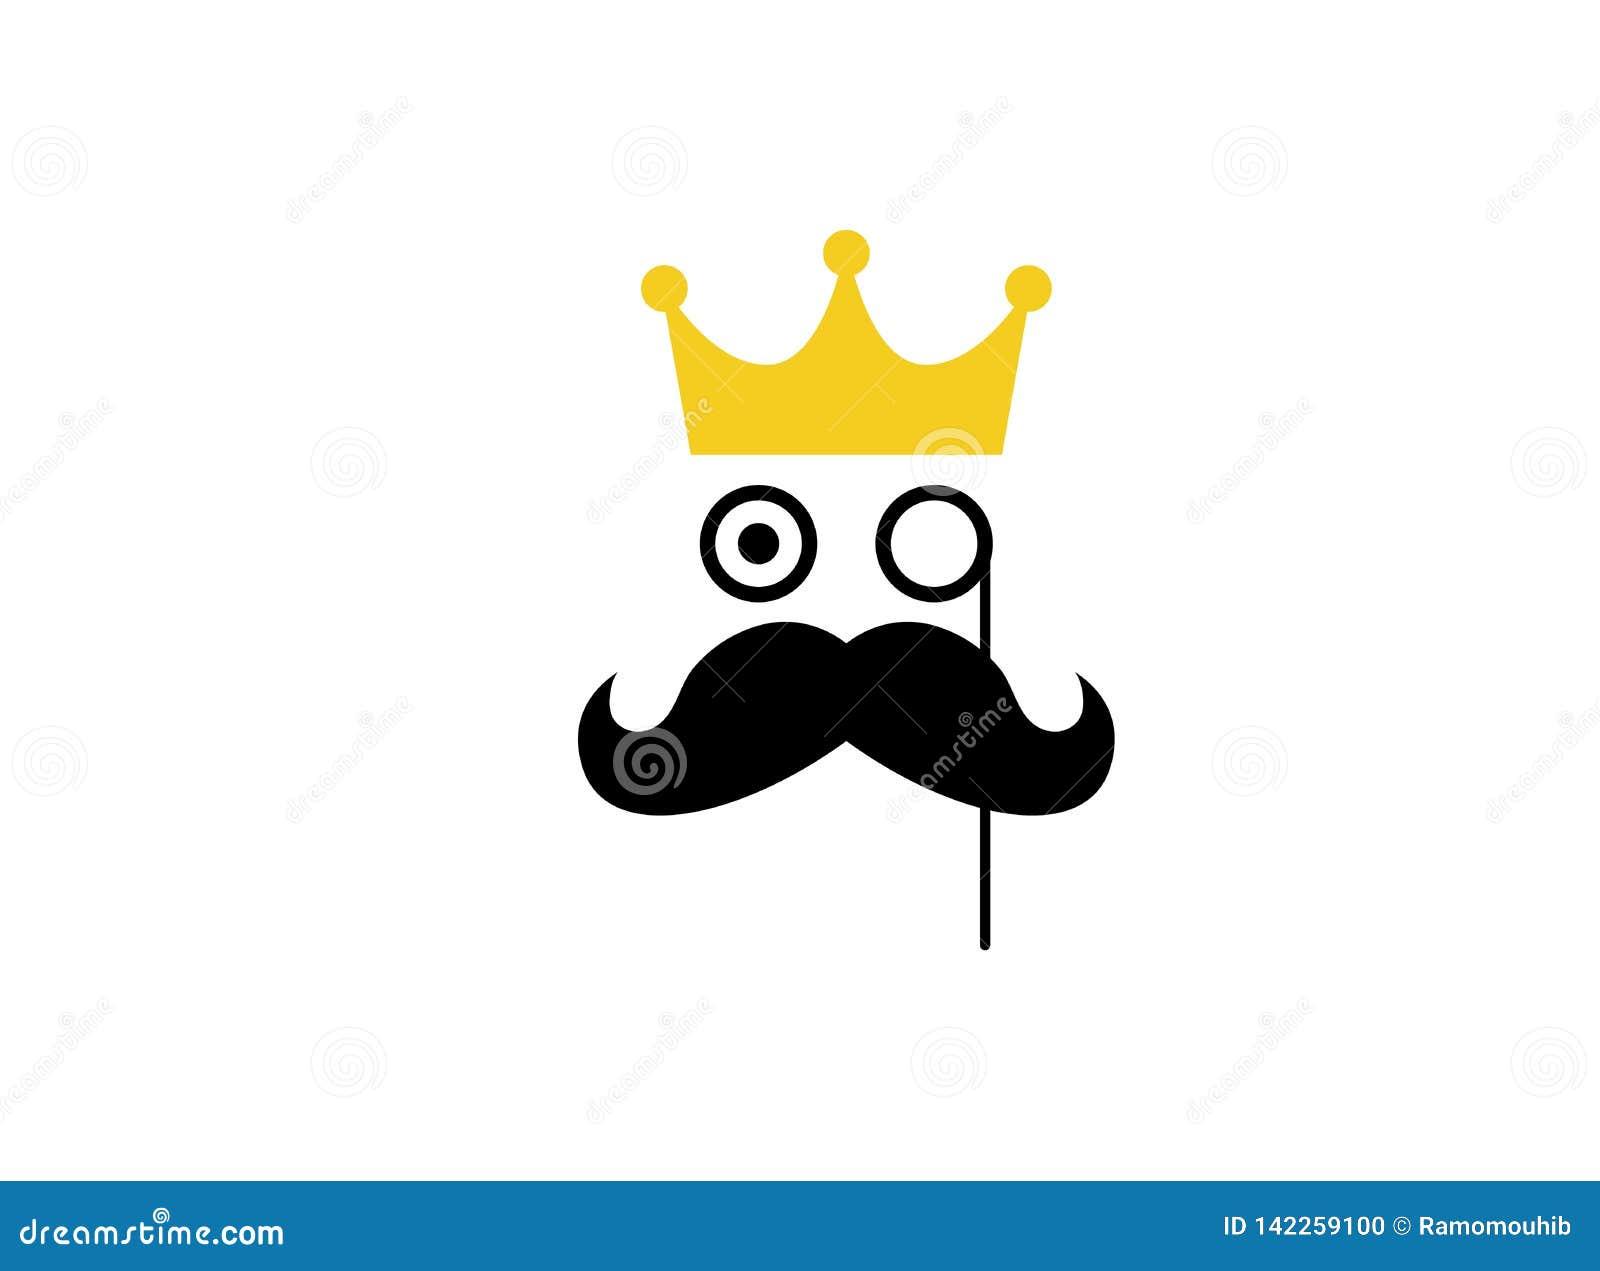 Gentelman prince crown mustache logo